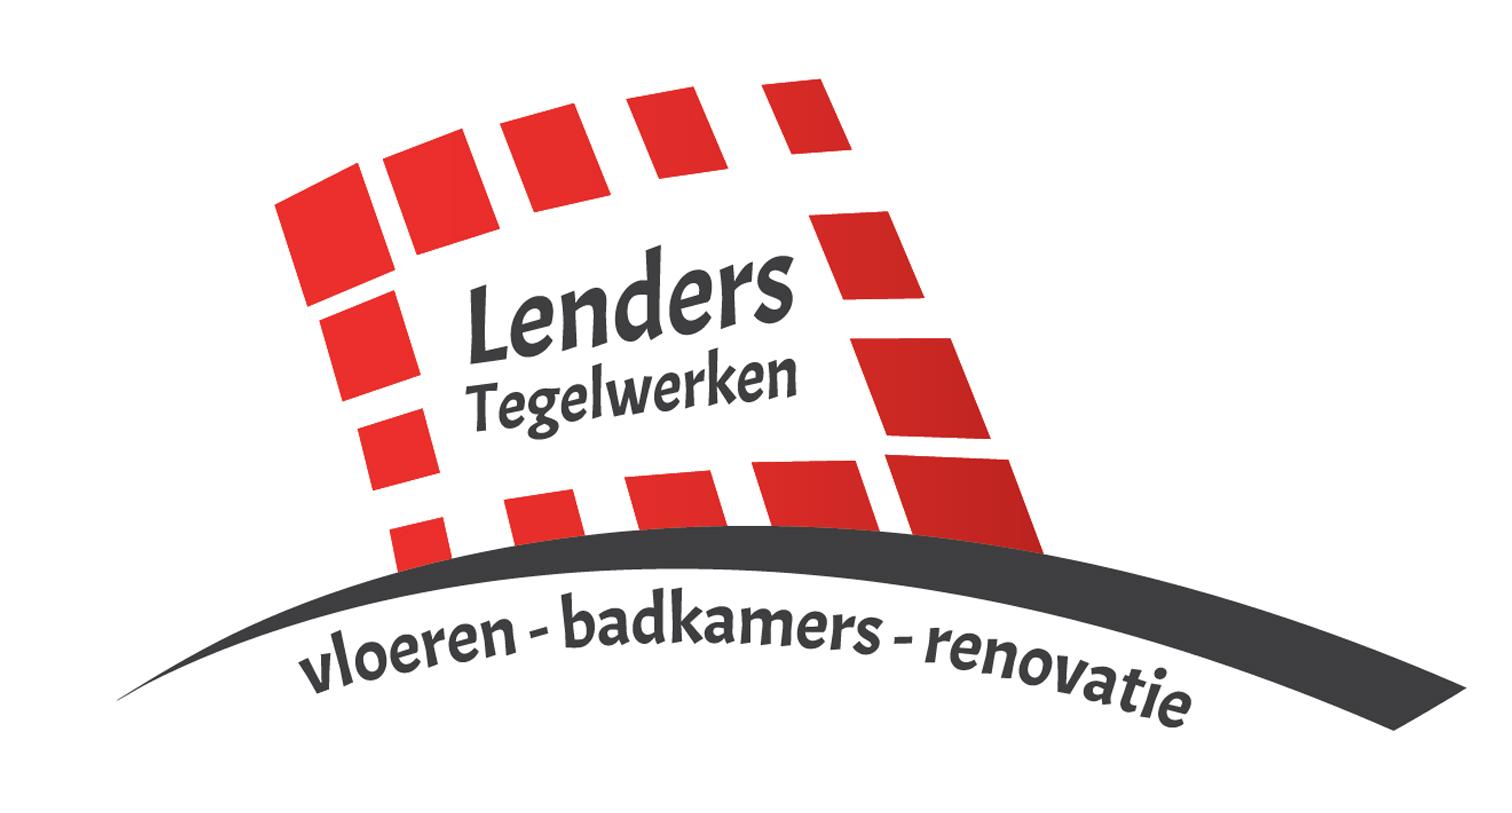 Lenders Tegelwerken